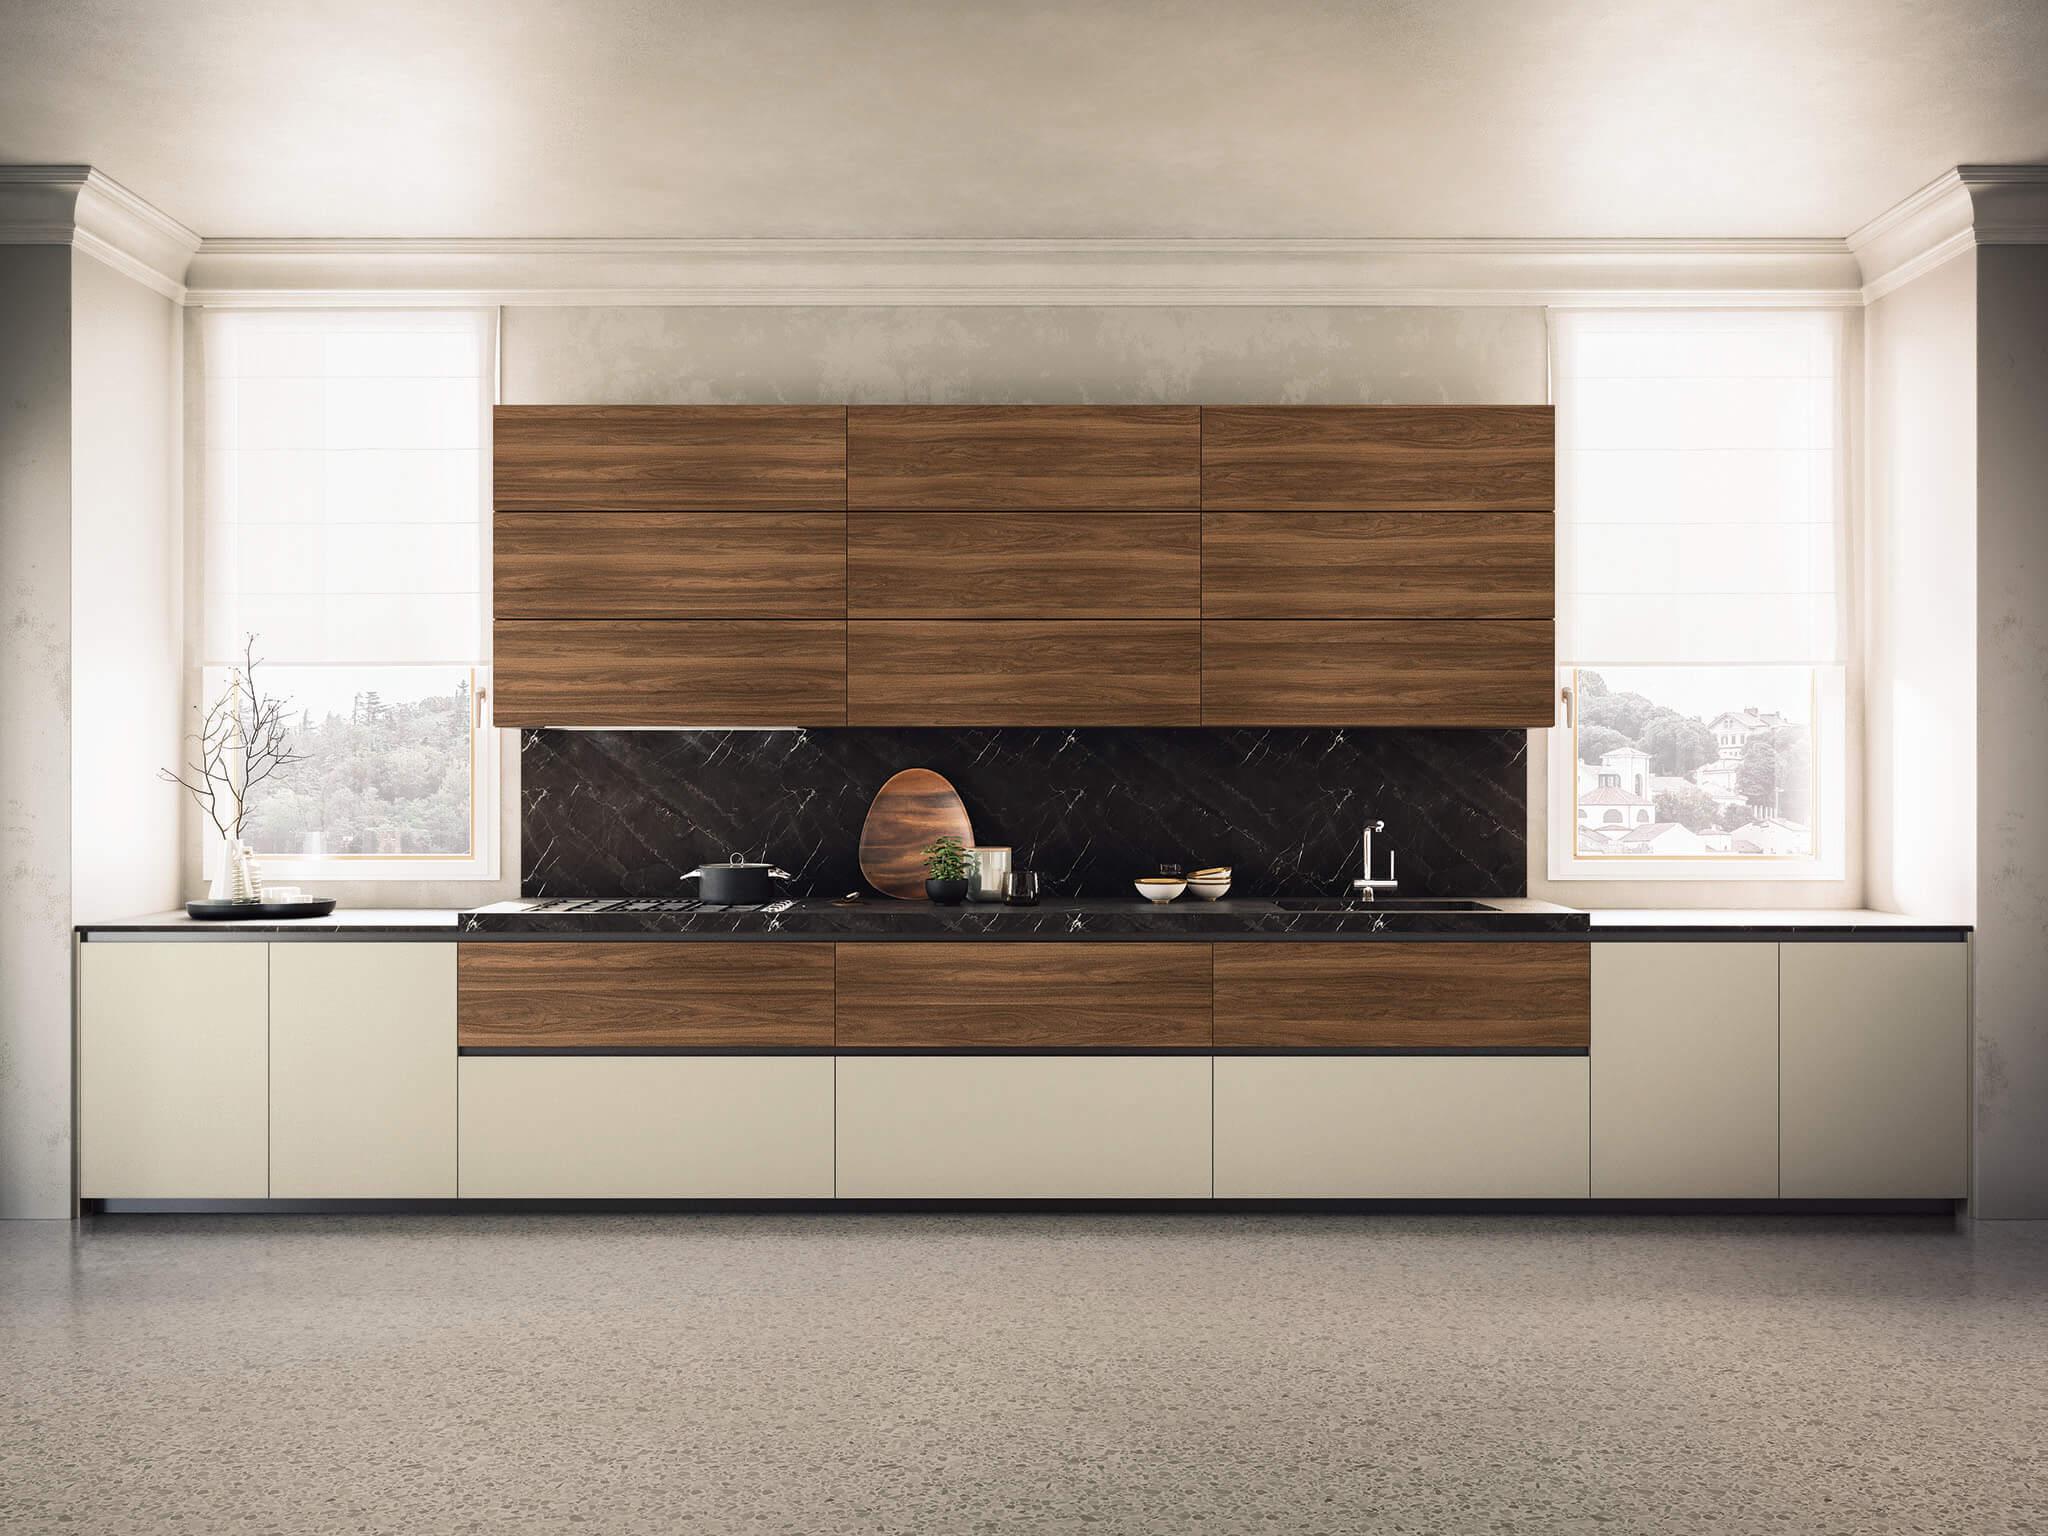 Kate contemporary kitchen cabinet walnut | Chicago